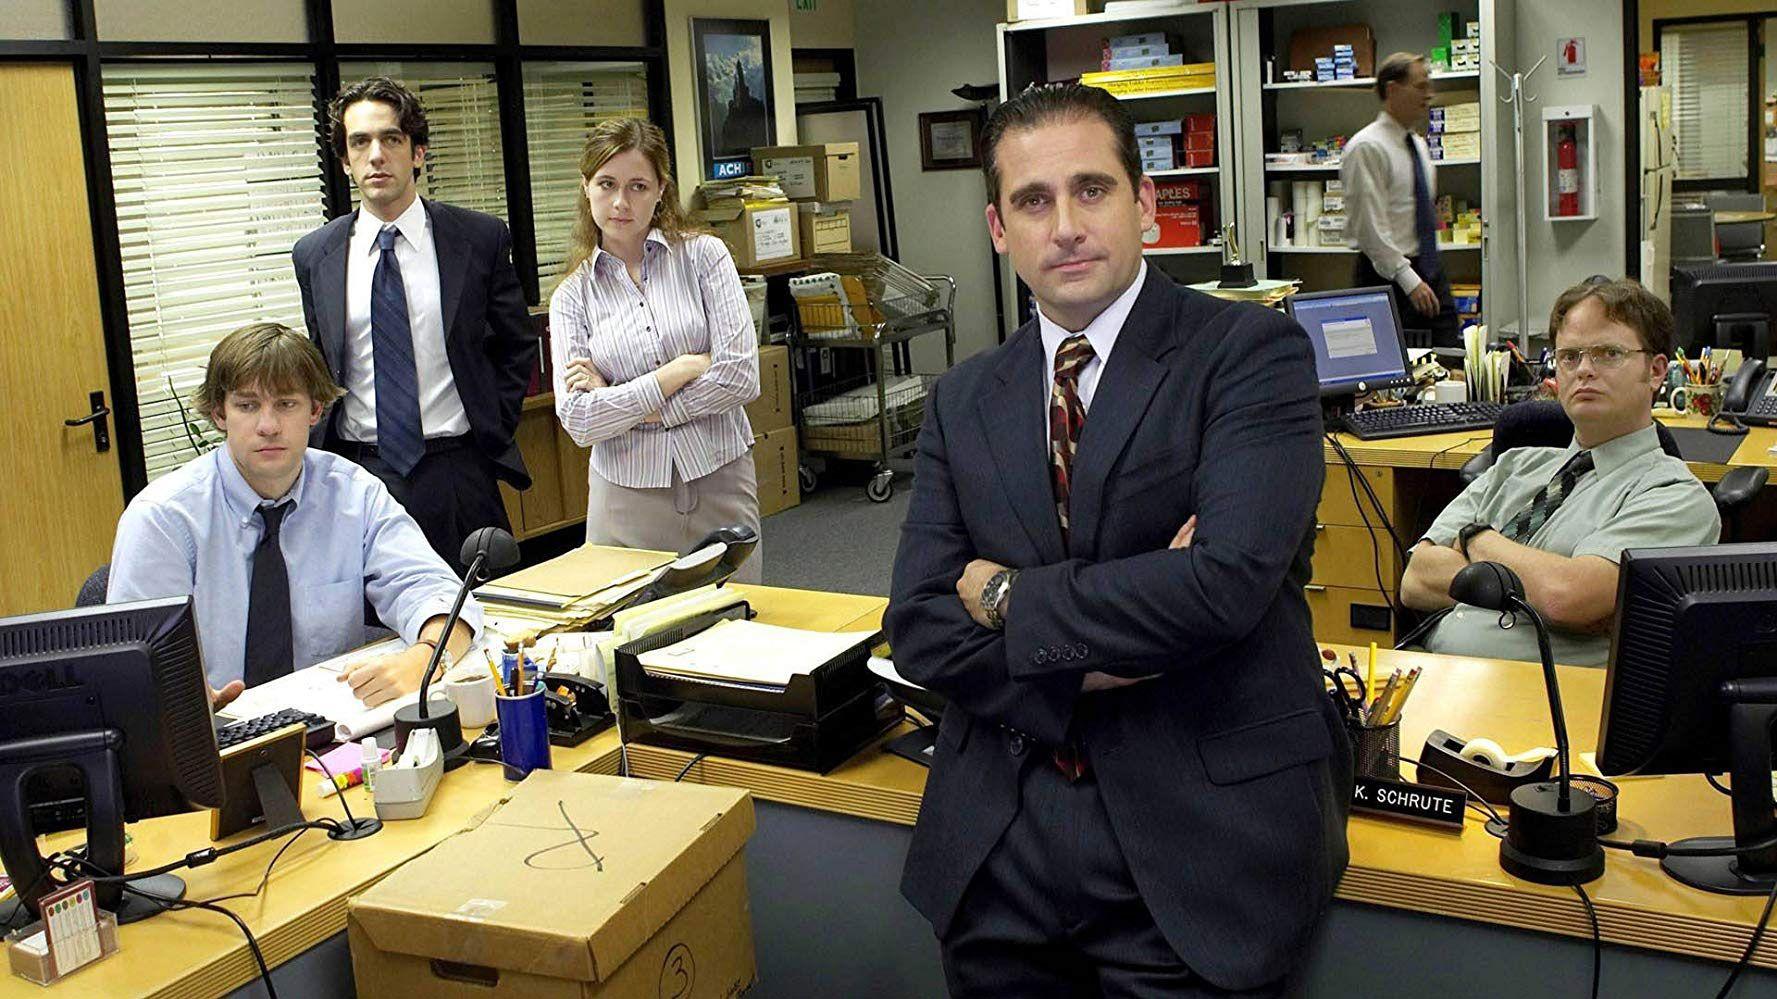 Office U.K. Vs Office U.S.A